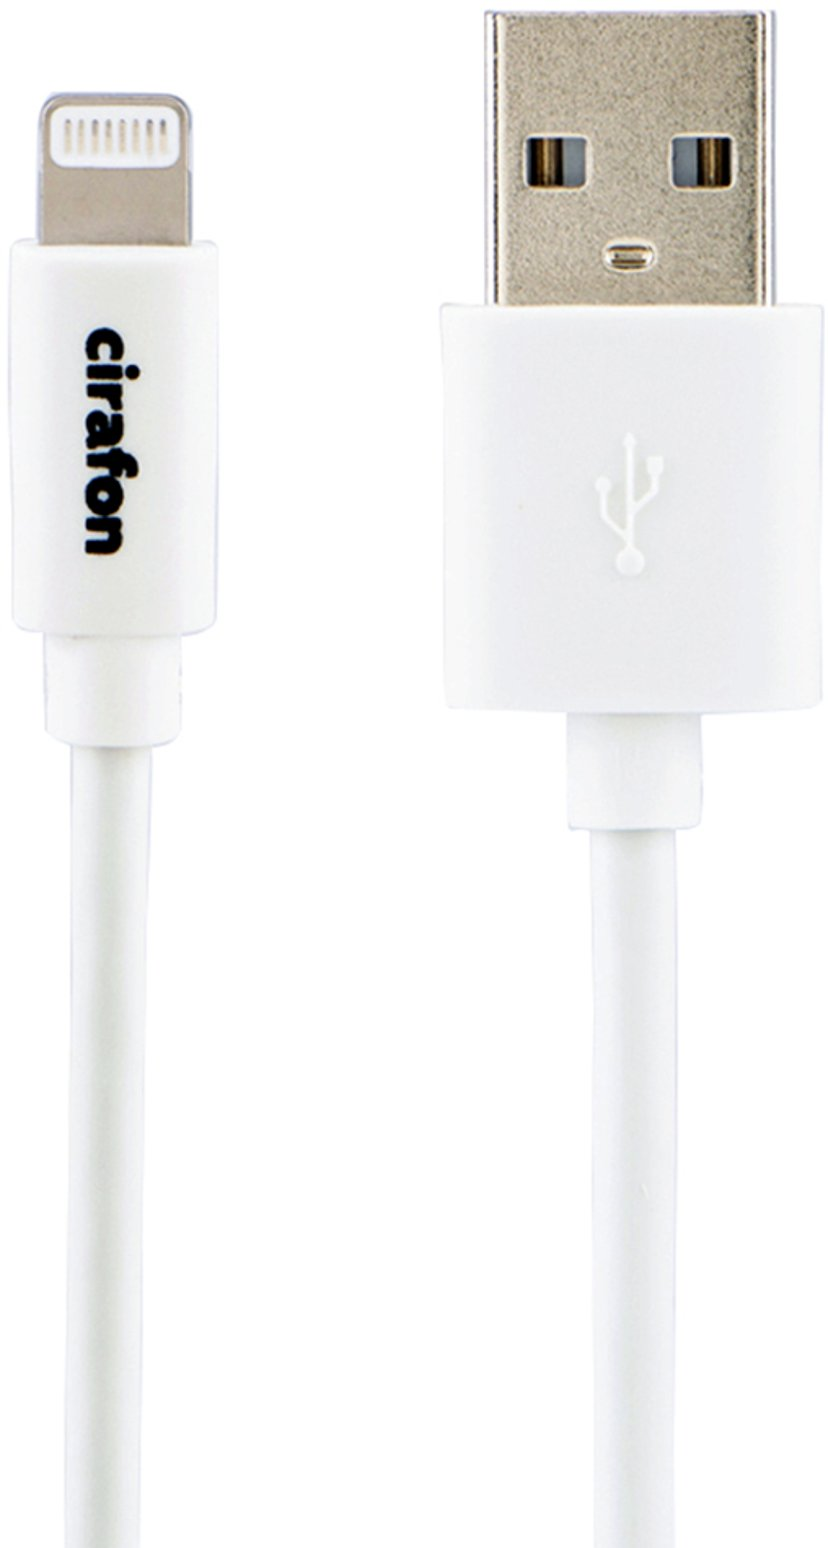 Cirafon Cirafon AM To Lightning Cable 0.15m - White - New Mfi 0.15m Valkoinen